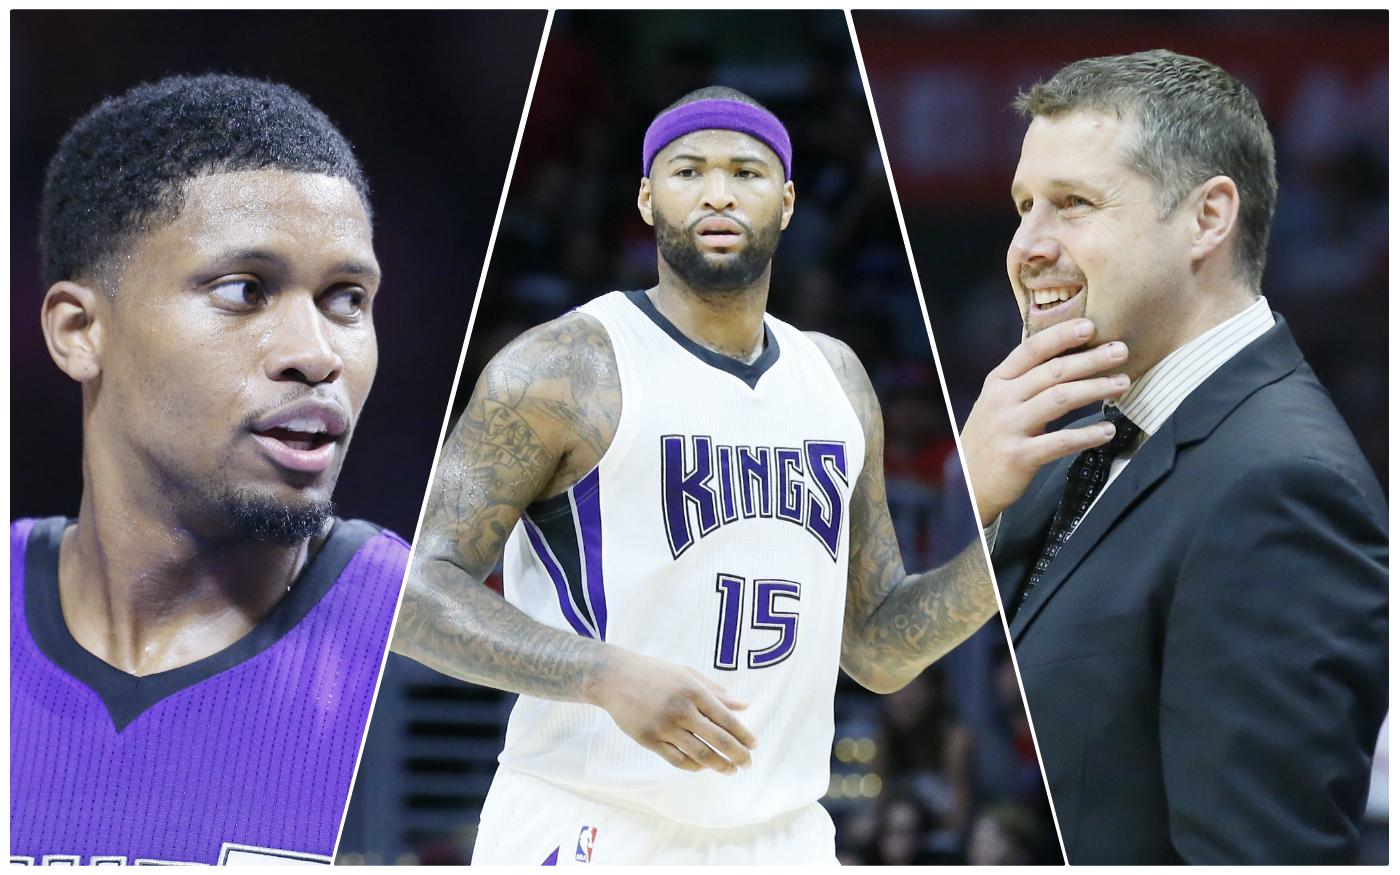 Les Sacramento Kings, ça sent encore le sapin